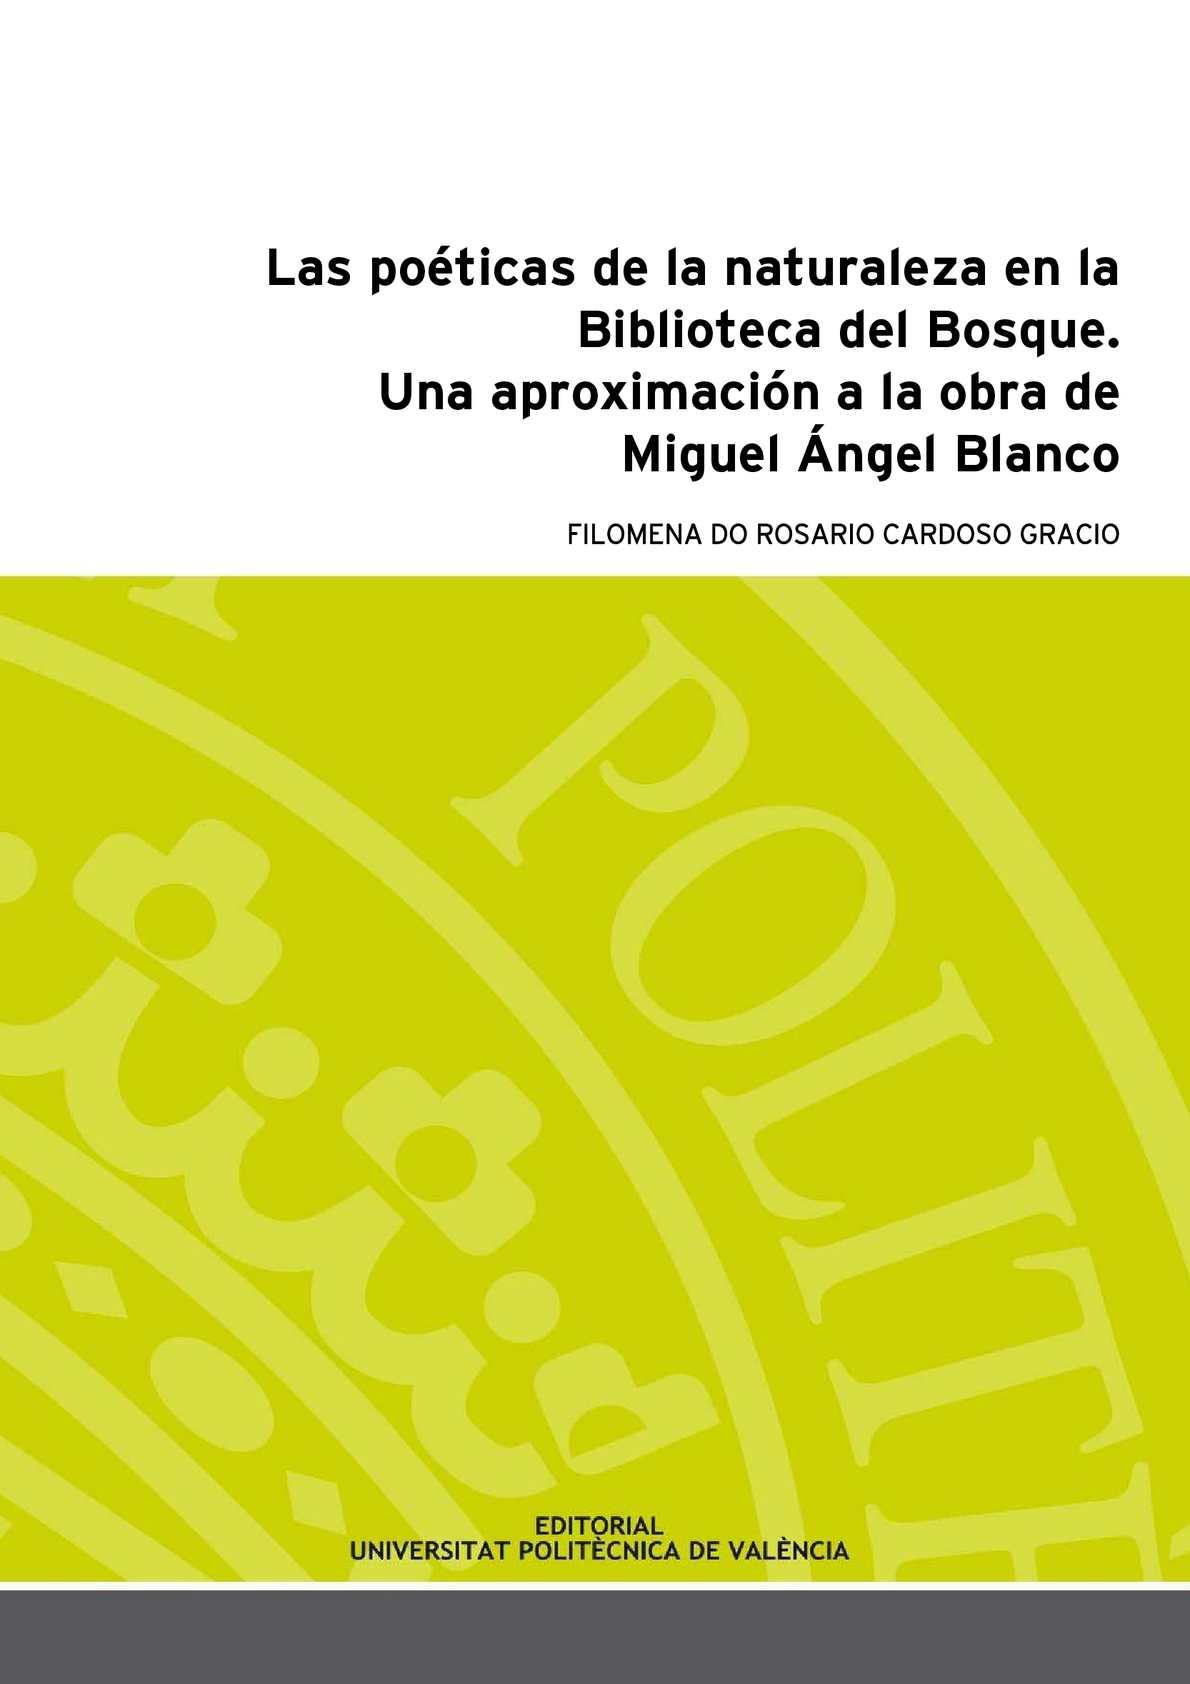 Calaméo - Las poéticas de la naturaleza en la Biblioteca del Bosque a95fbb5a0e4